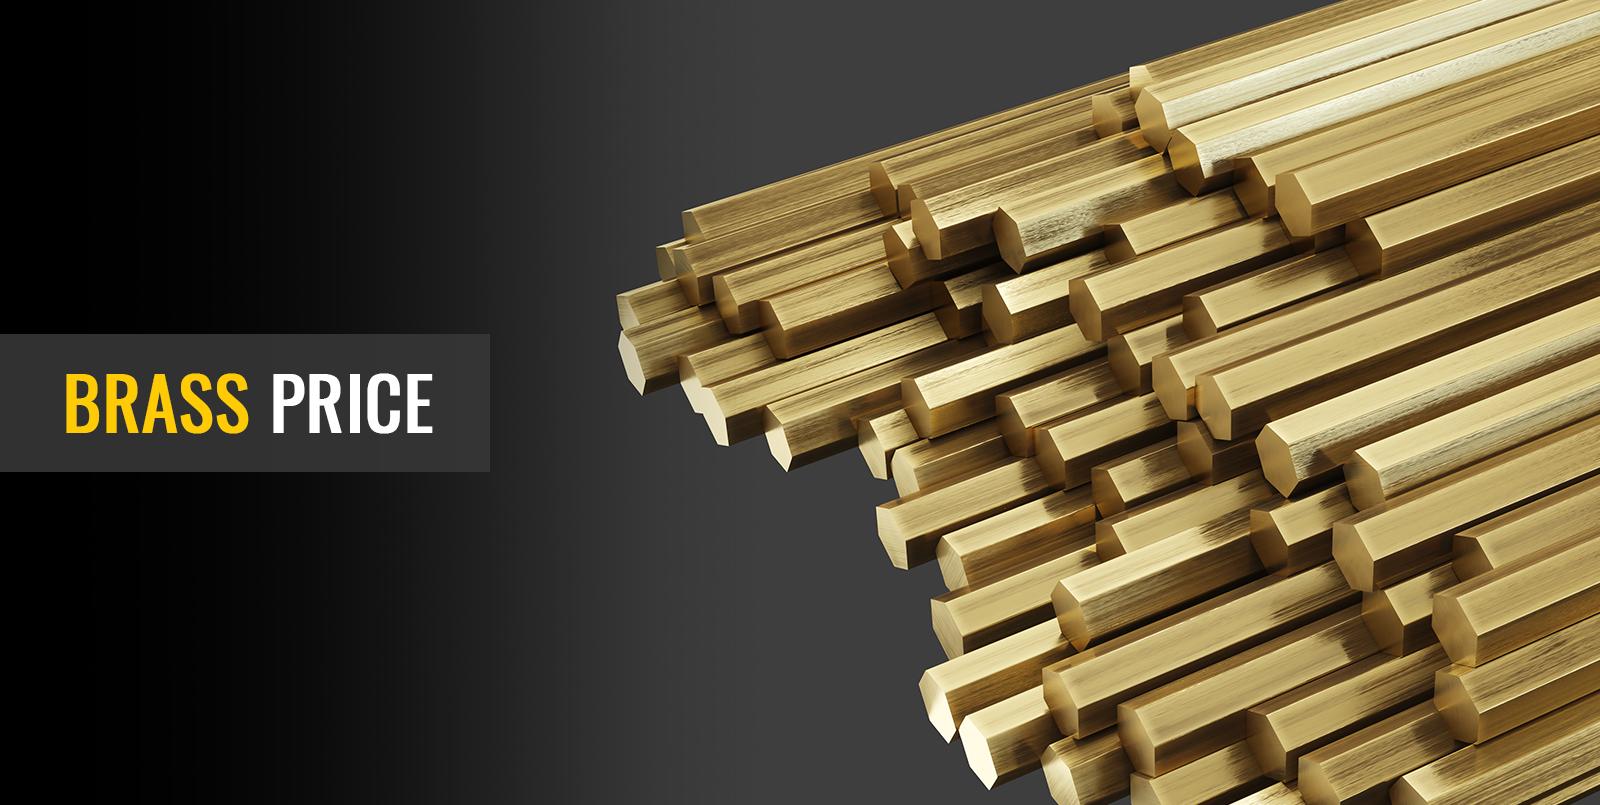 Brass Price